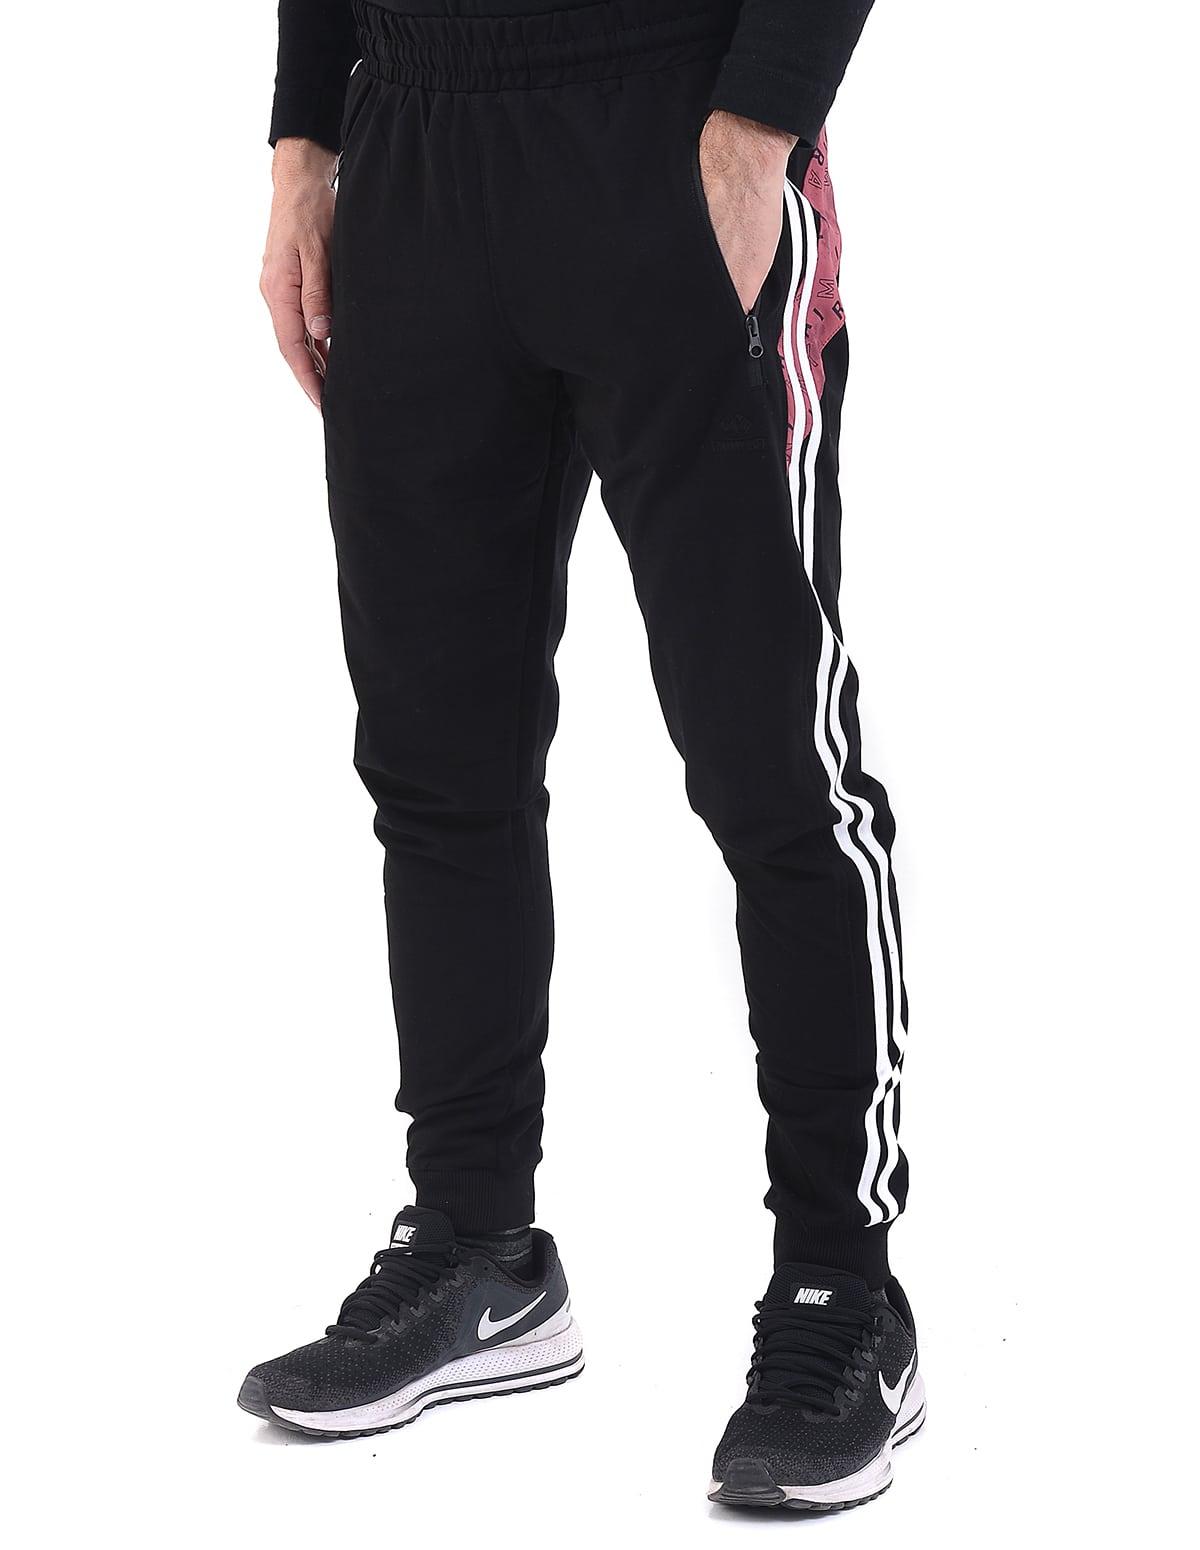 b83f30db0e99 Ανδρικό παντελόνι φόρμας jogger με λάστιχο στο πόδι σε μαύρο χρώμα και  λευκή ρίγα - vactive.gr